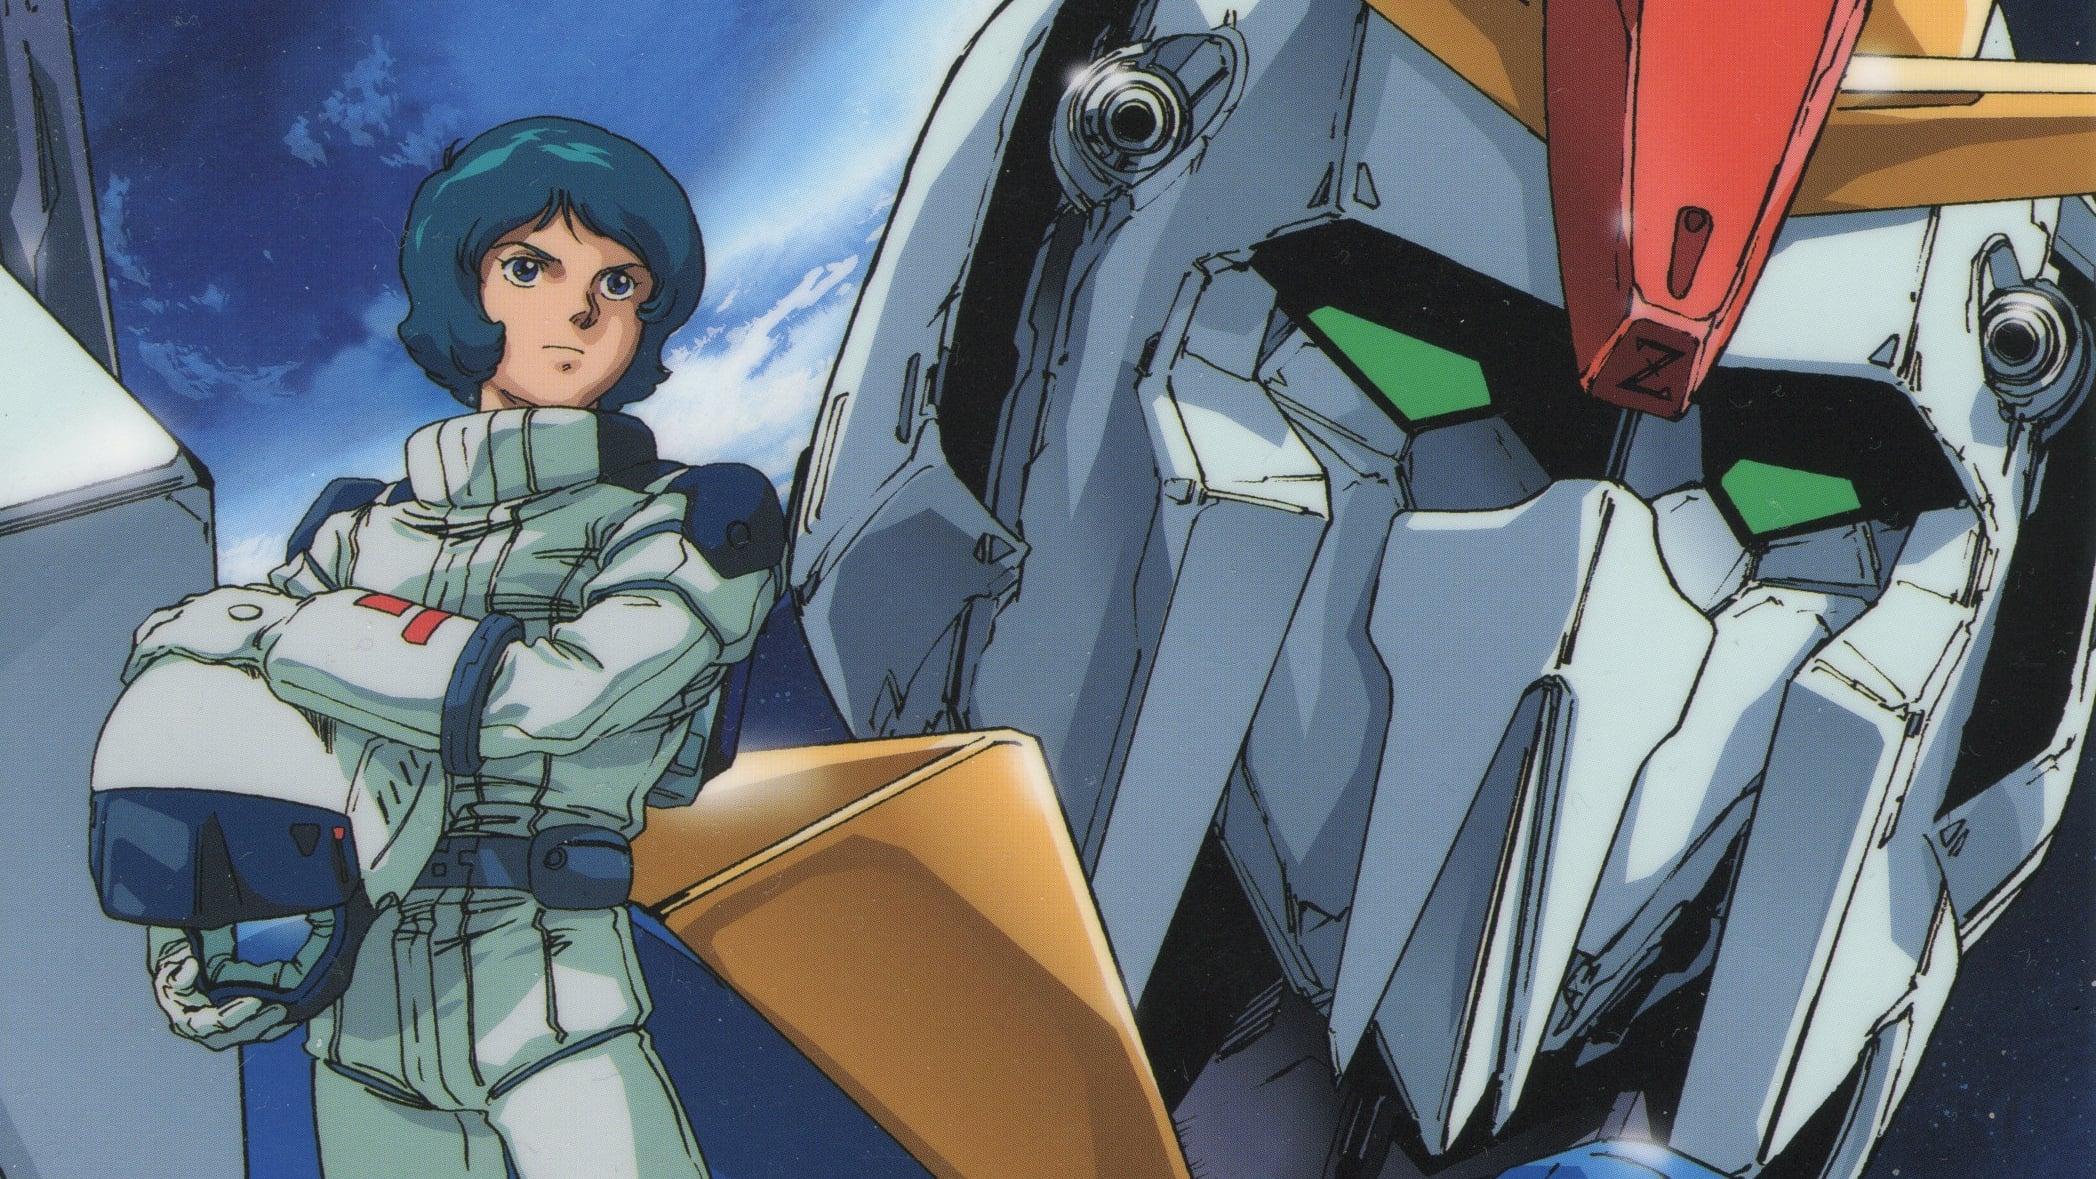 Portada de Mobile Suit Zeta Gundam